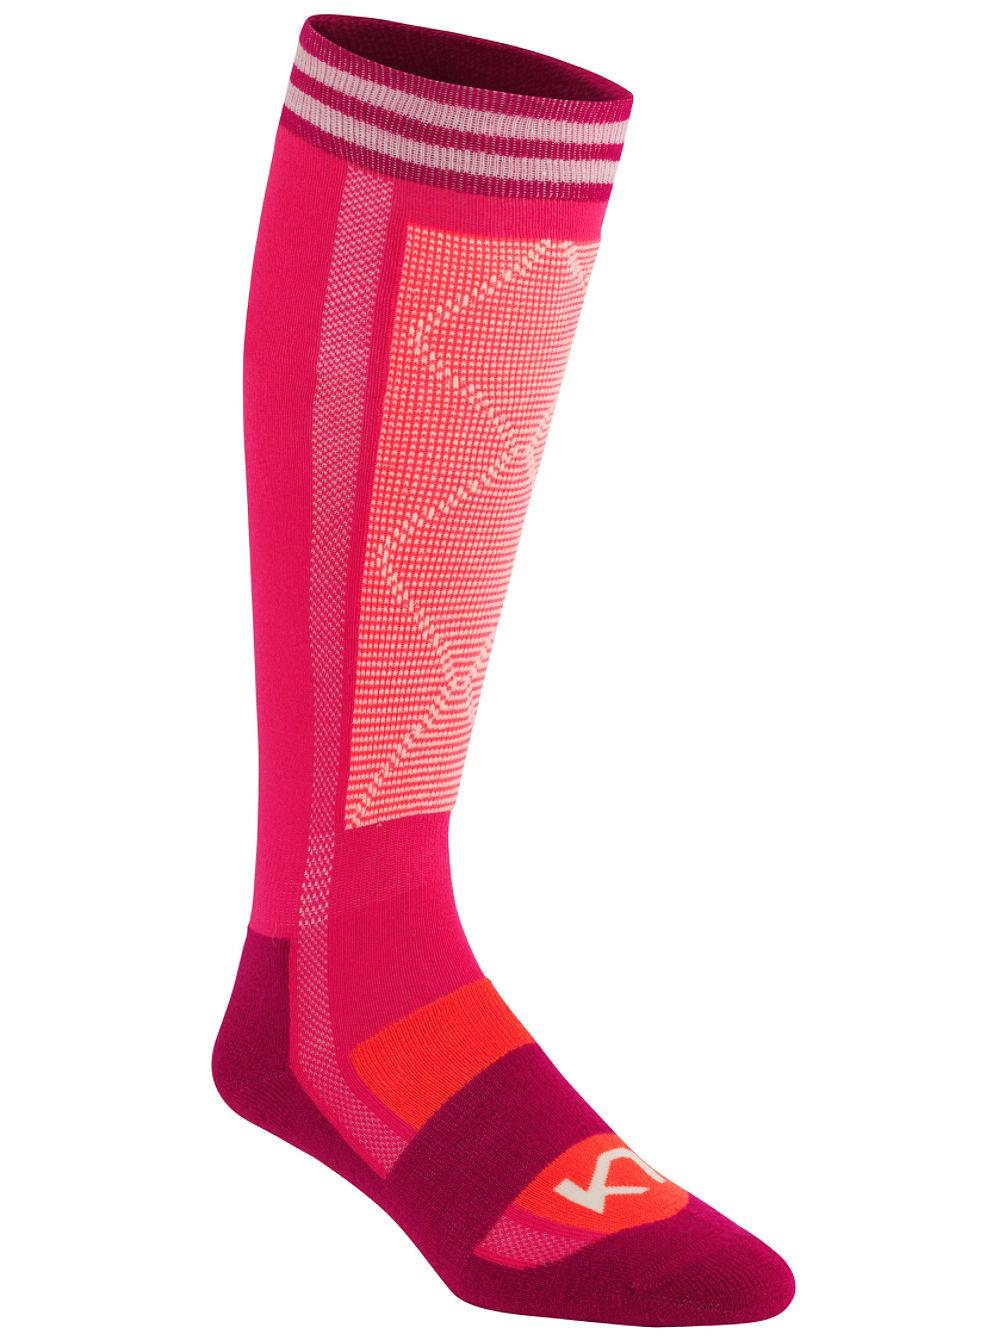 acro-tech-socks-36-37